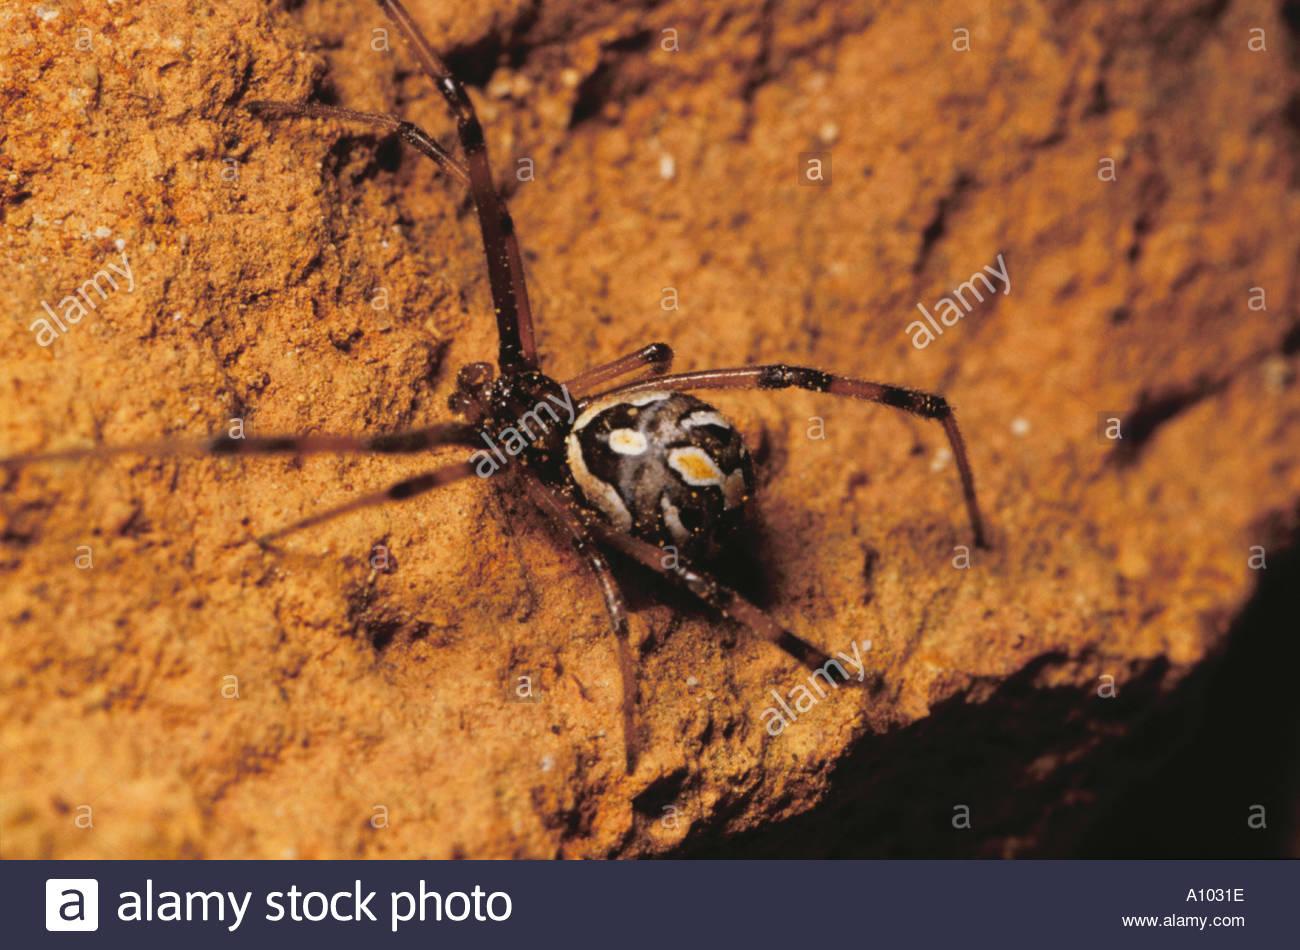 Colorful California spider Theridion aff muraruim - Stock Image